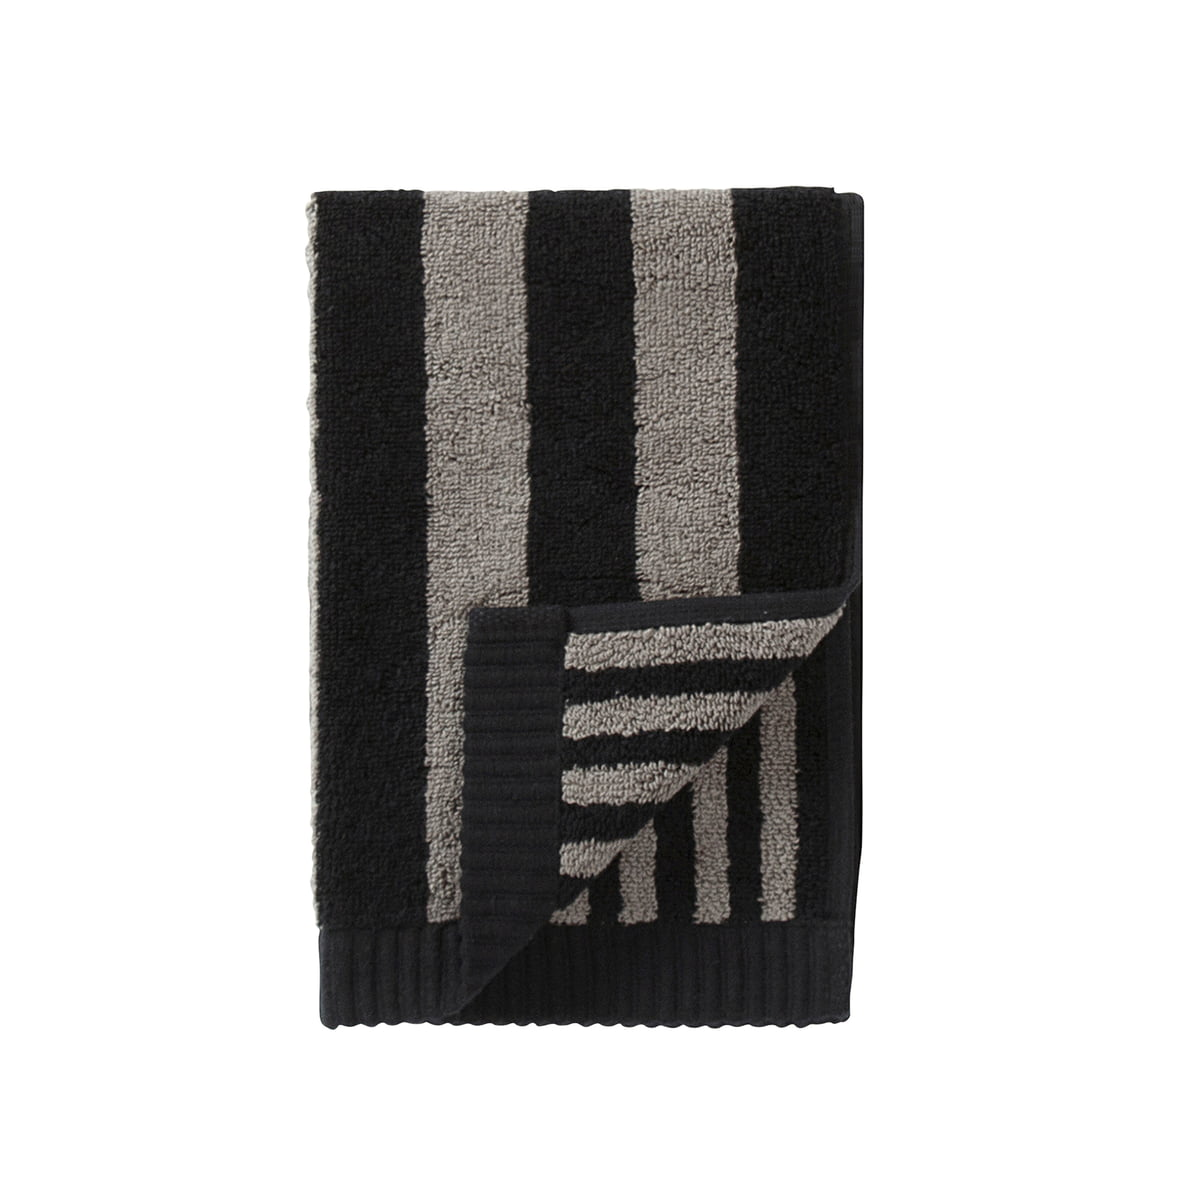 Marimekko - Kaksi Raitaa Gästehandtuch 30 x 50 cm, grau / schwarz | Bad > Handtücher | Verschiedene farben | marimekko